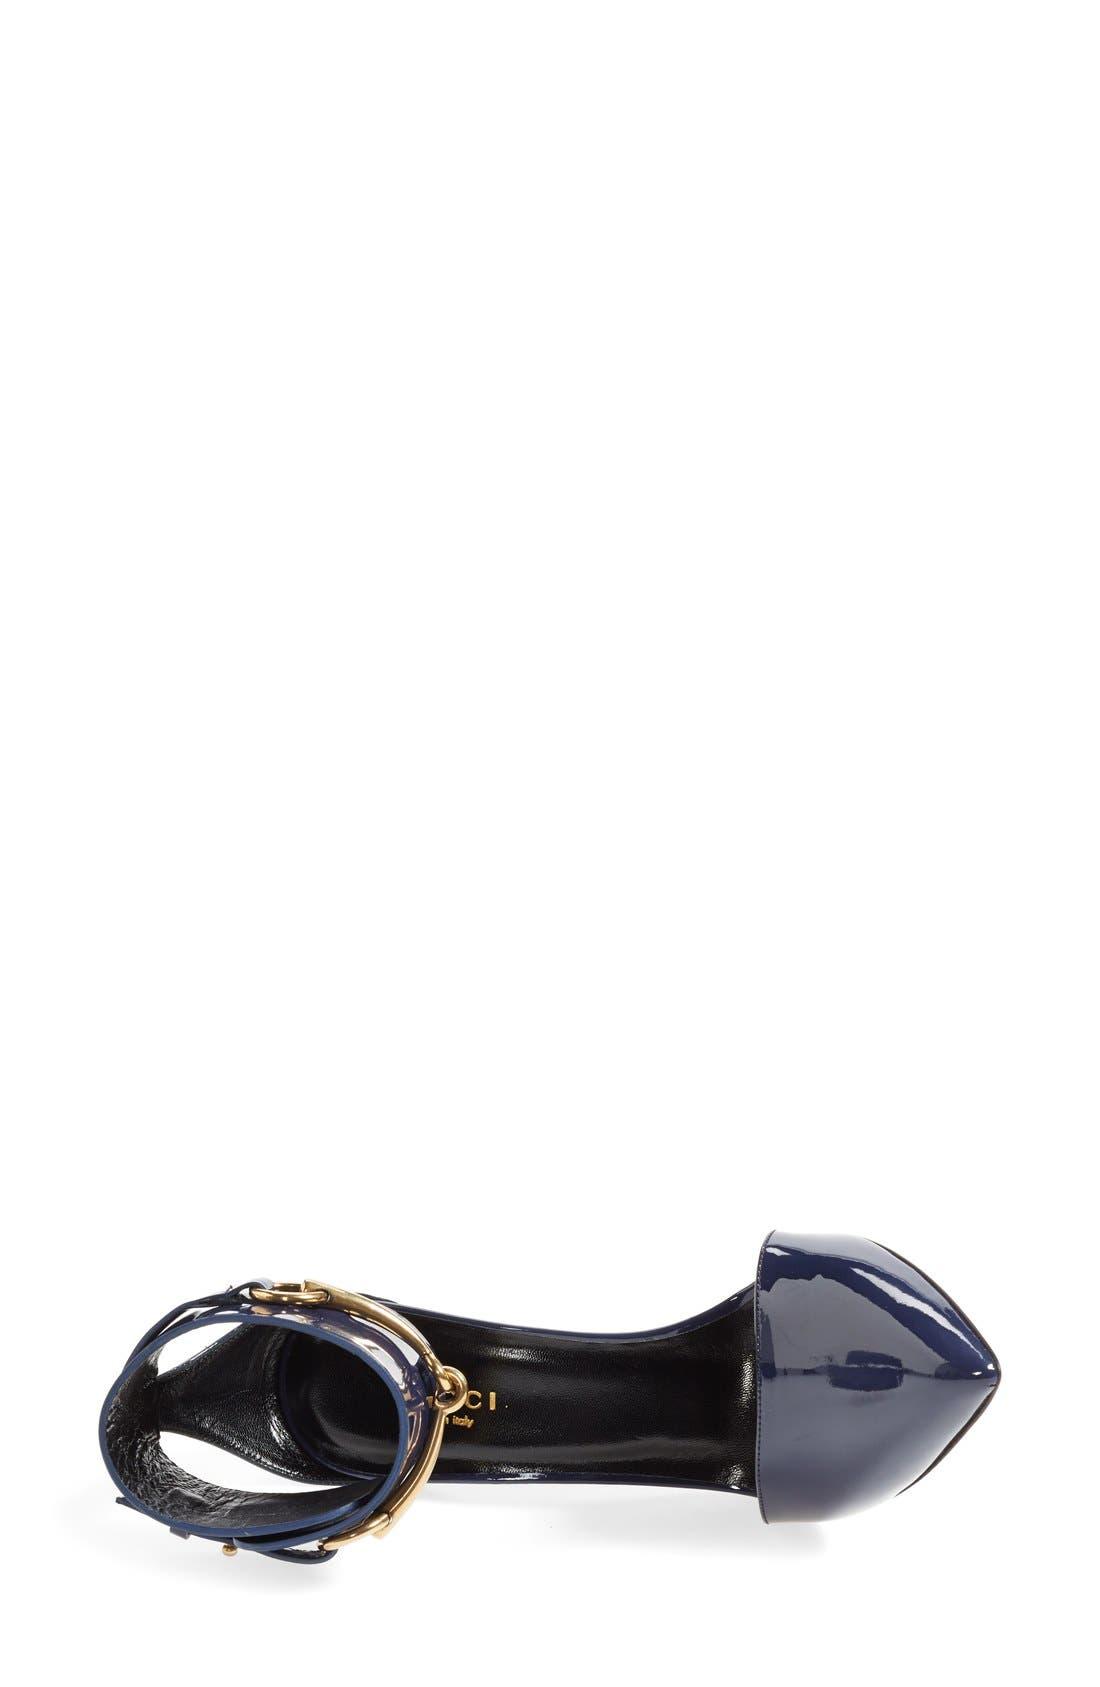 Alternate Image 3  - Gucci 'Ursula' Ankle Cuff Pointy Toe Pump